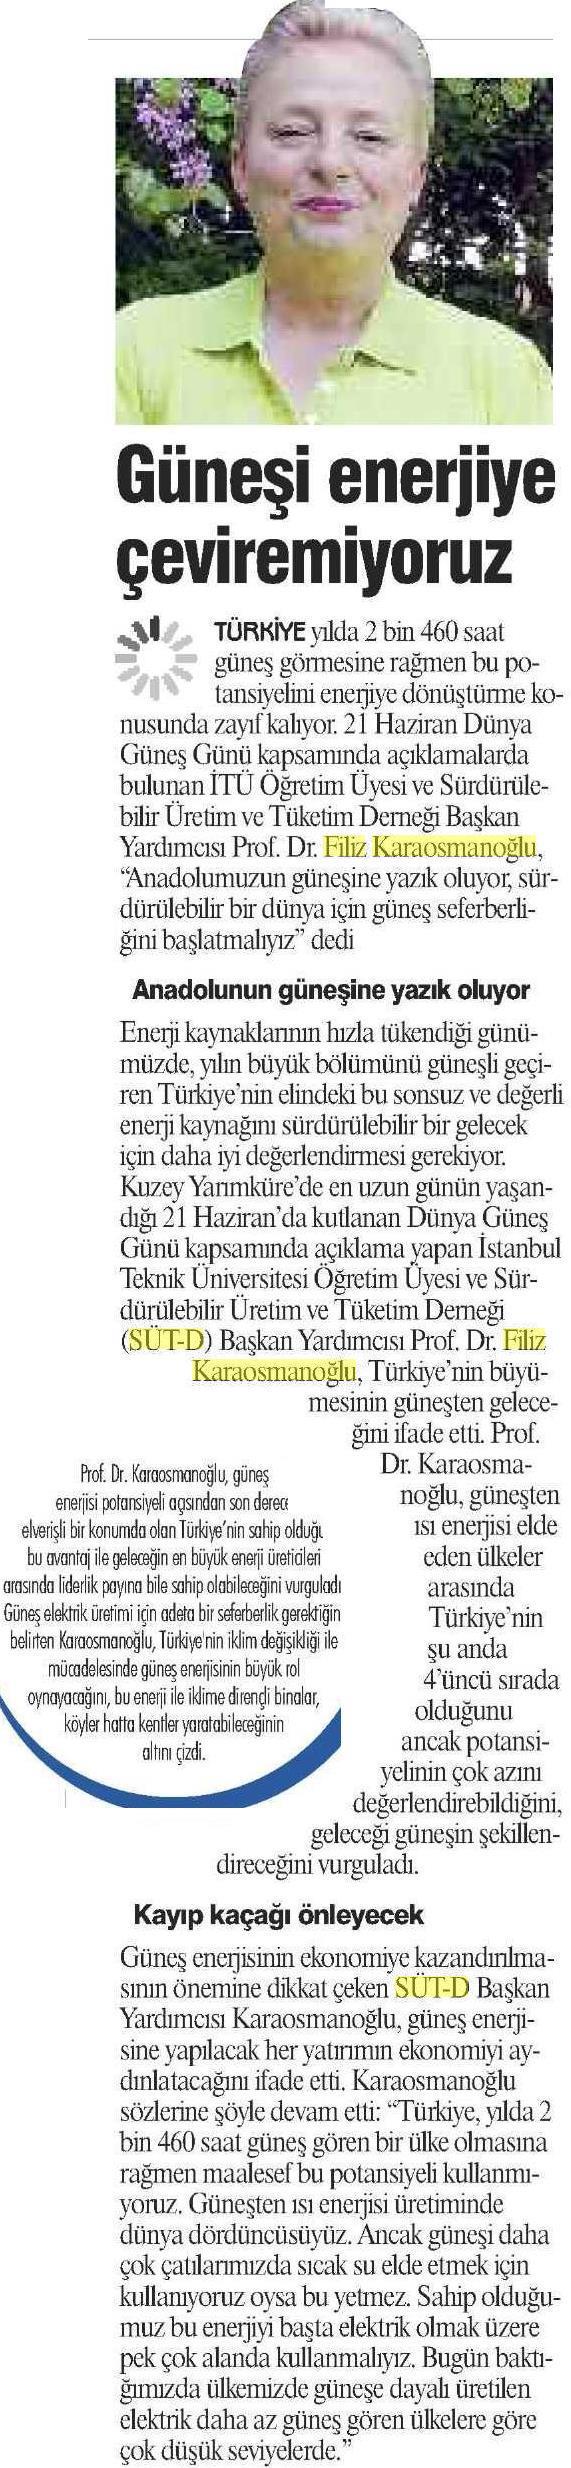 Gazetem İstanbul 21.06.2016